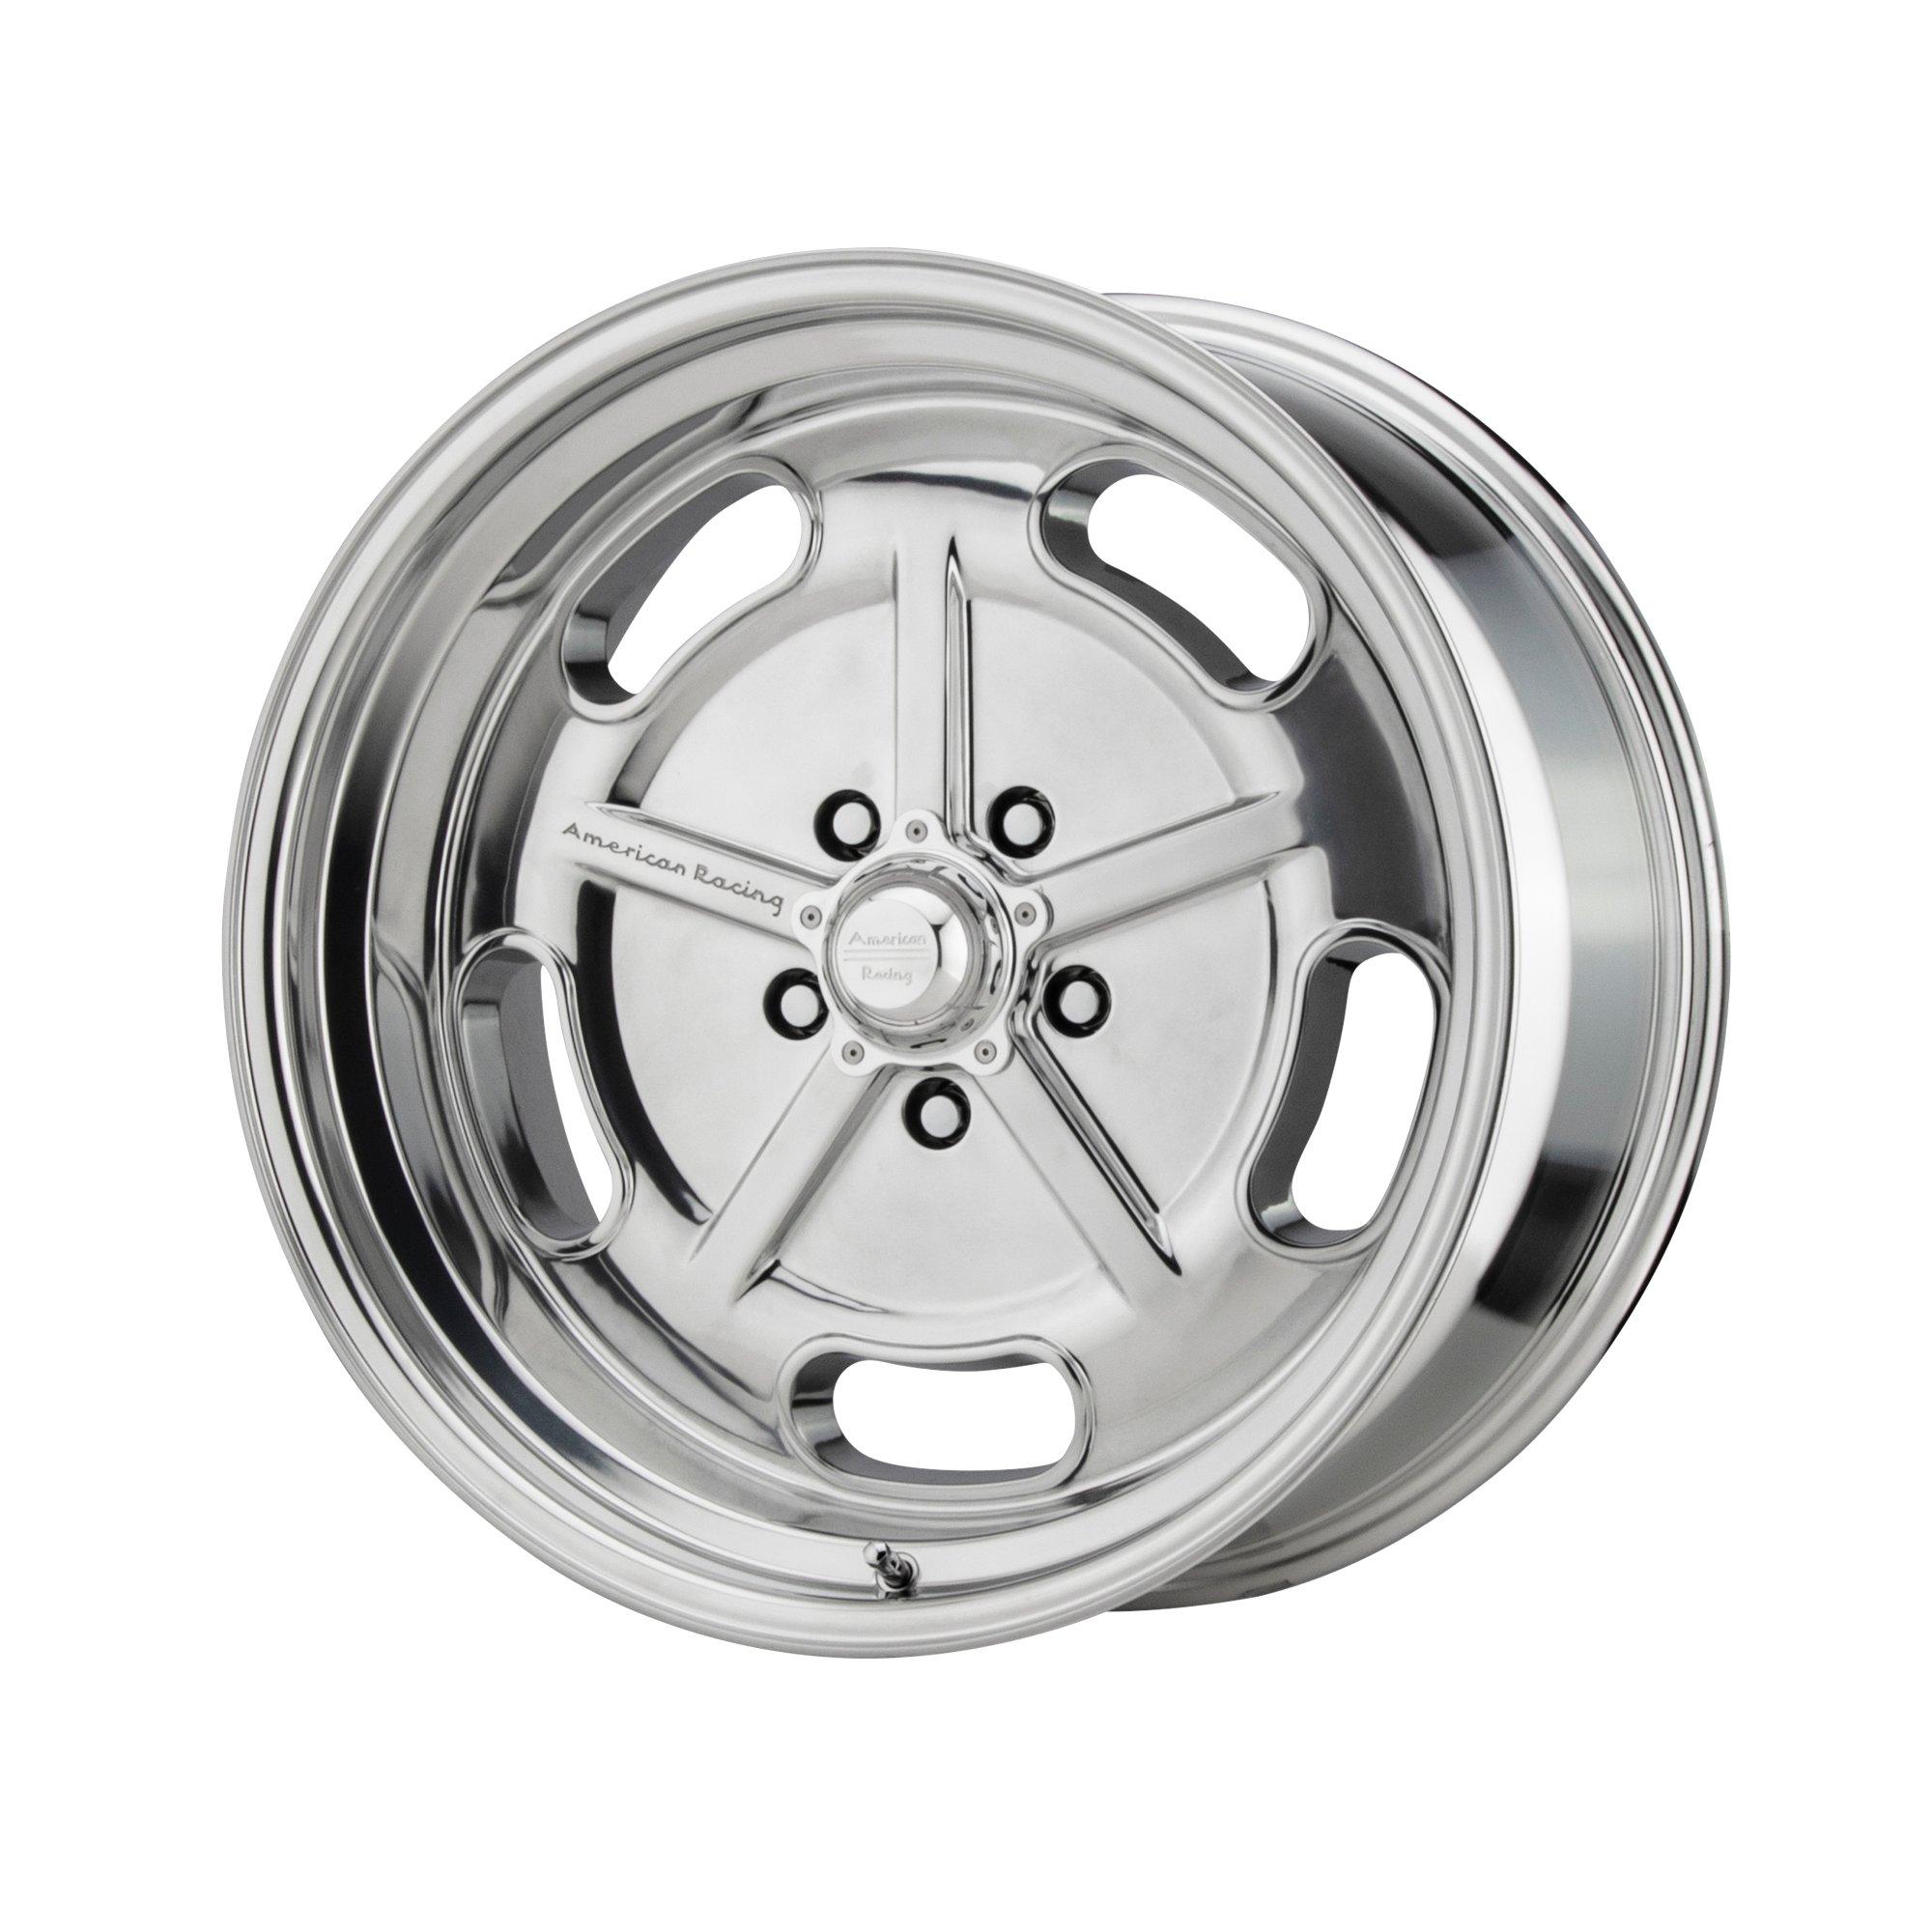 American Racing 18x10 VN215 Classic Torq Thrust II Wheel Gray Mach 5x5//127 6